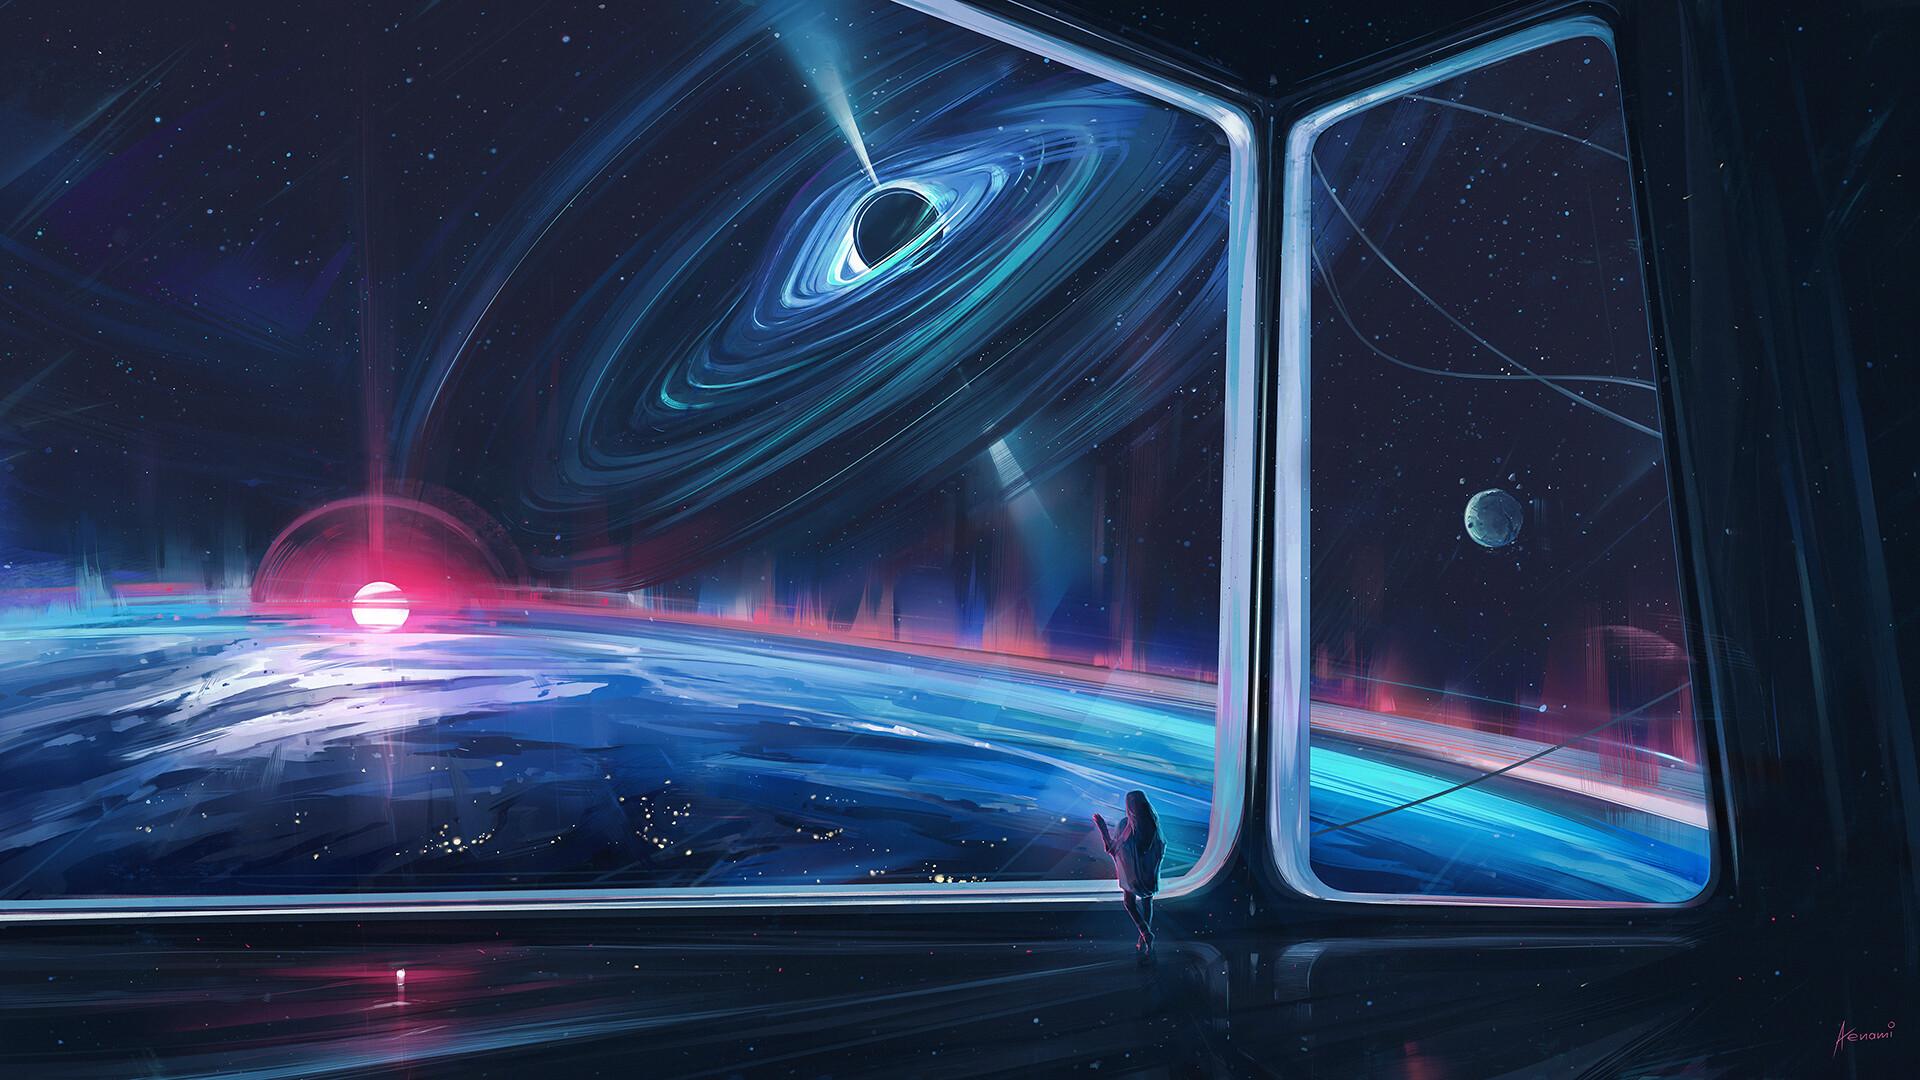 General 1920x1080 digital art artwork Aenami planet space stars science fiction futuristic